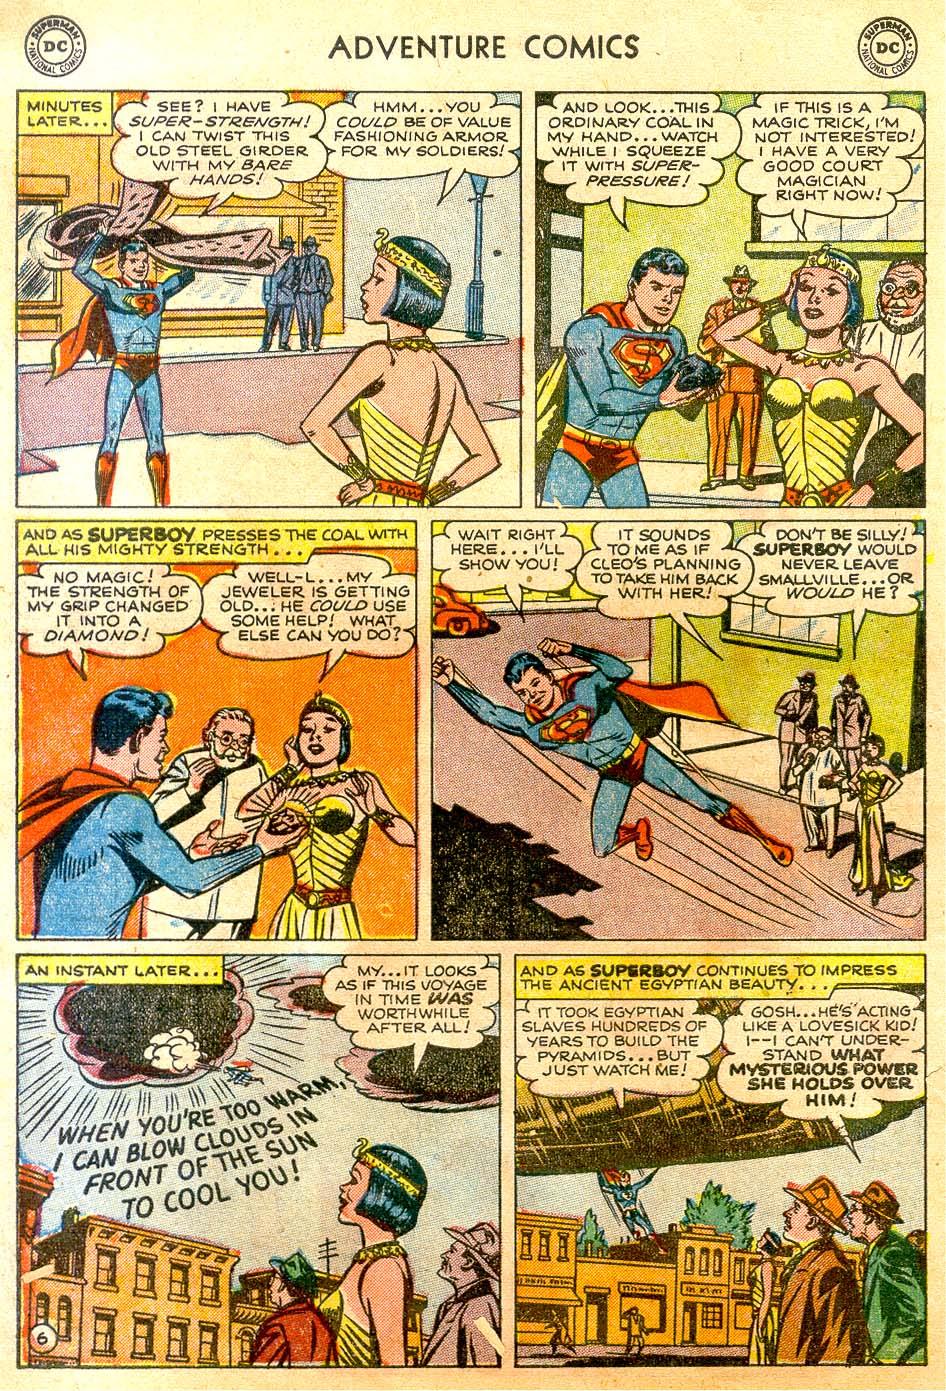 Read online Adventure Comics (1938) comic -  Issue #183 - 8